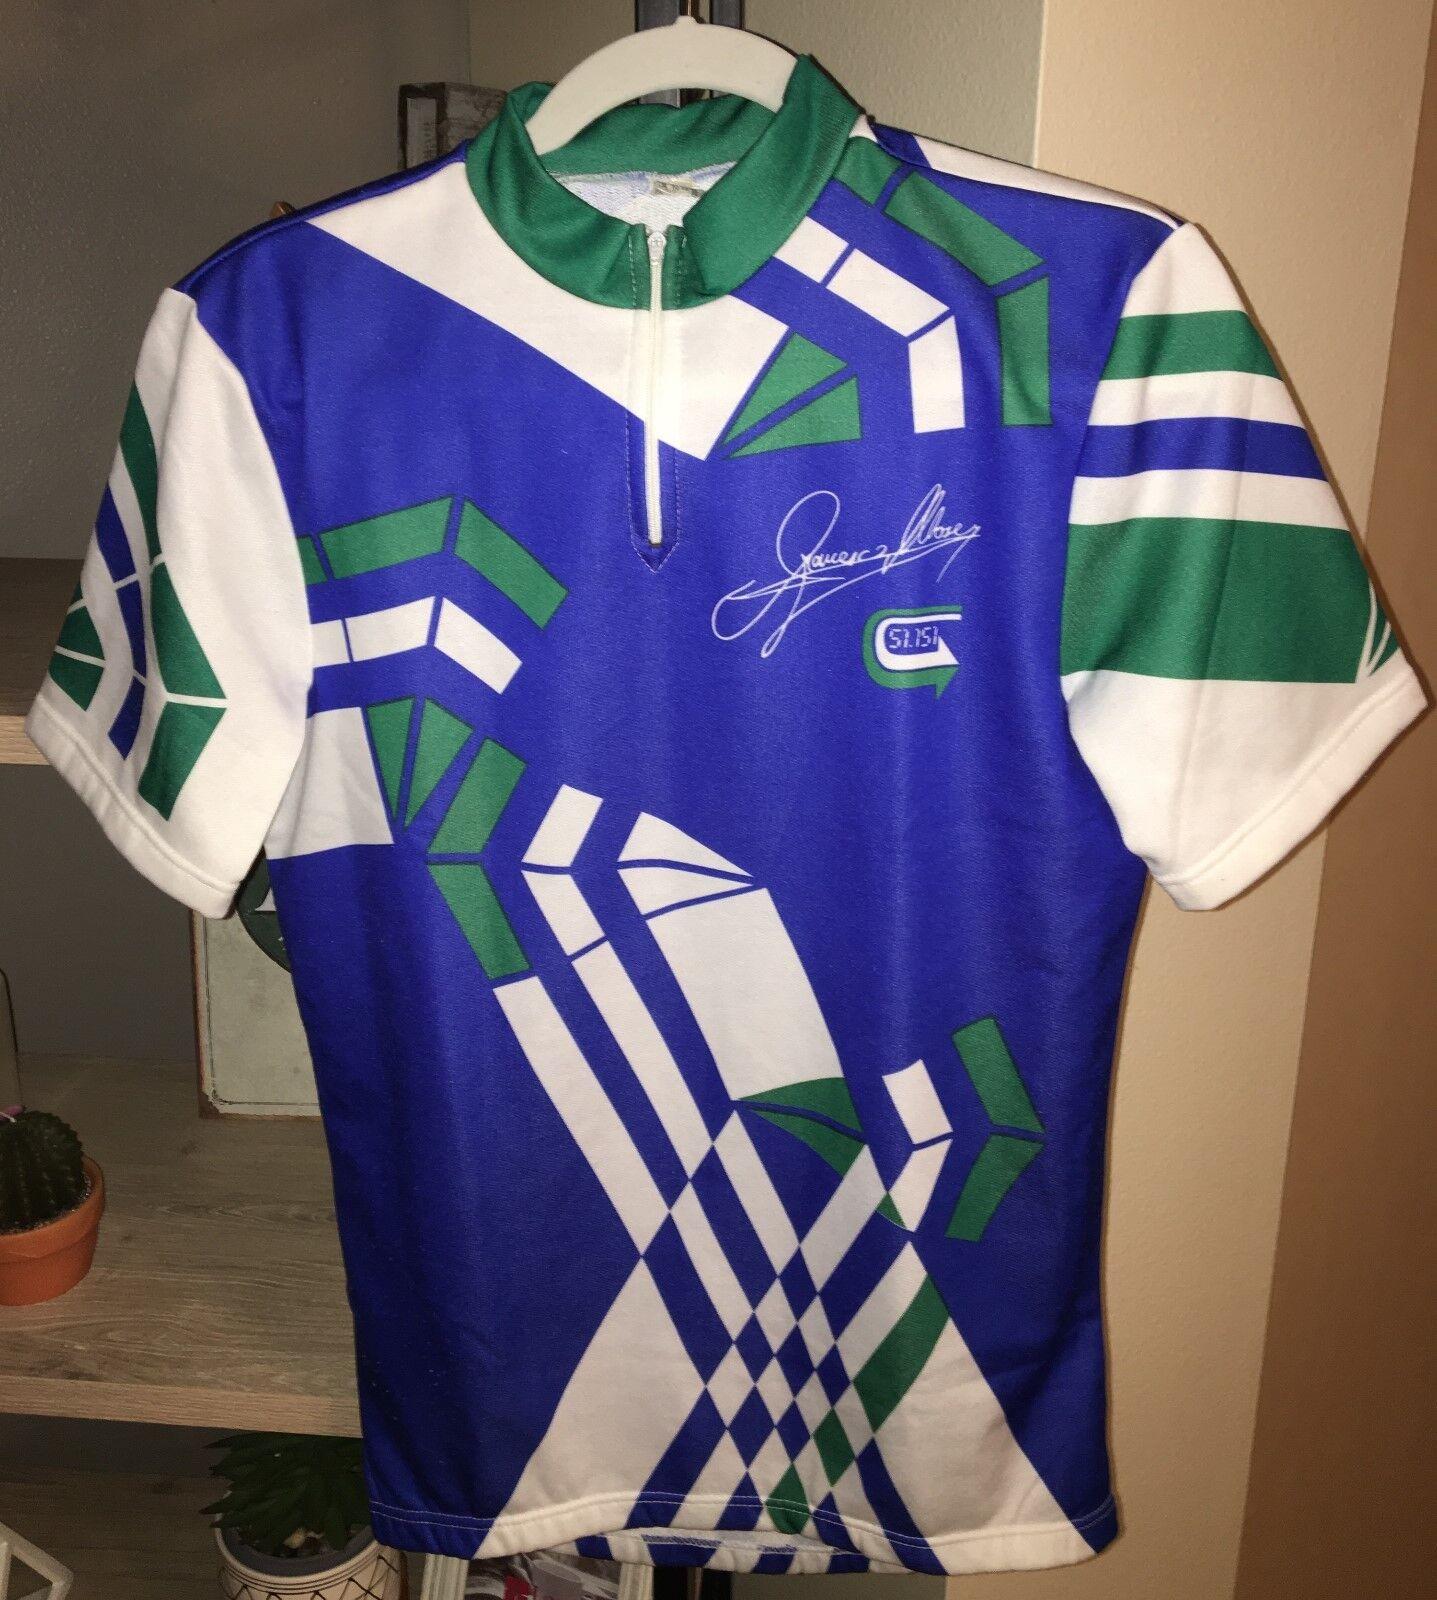 Francesco Moser 51.151 Vintage 80s Cycling Jersey Medium Large bluee Green